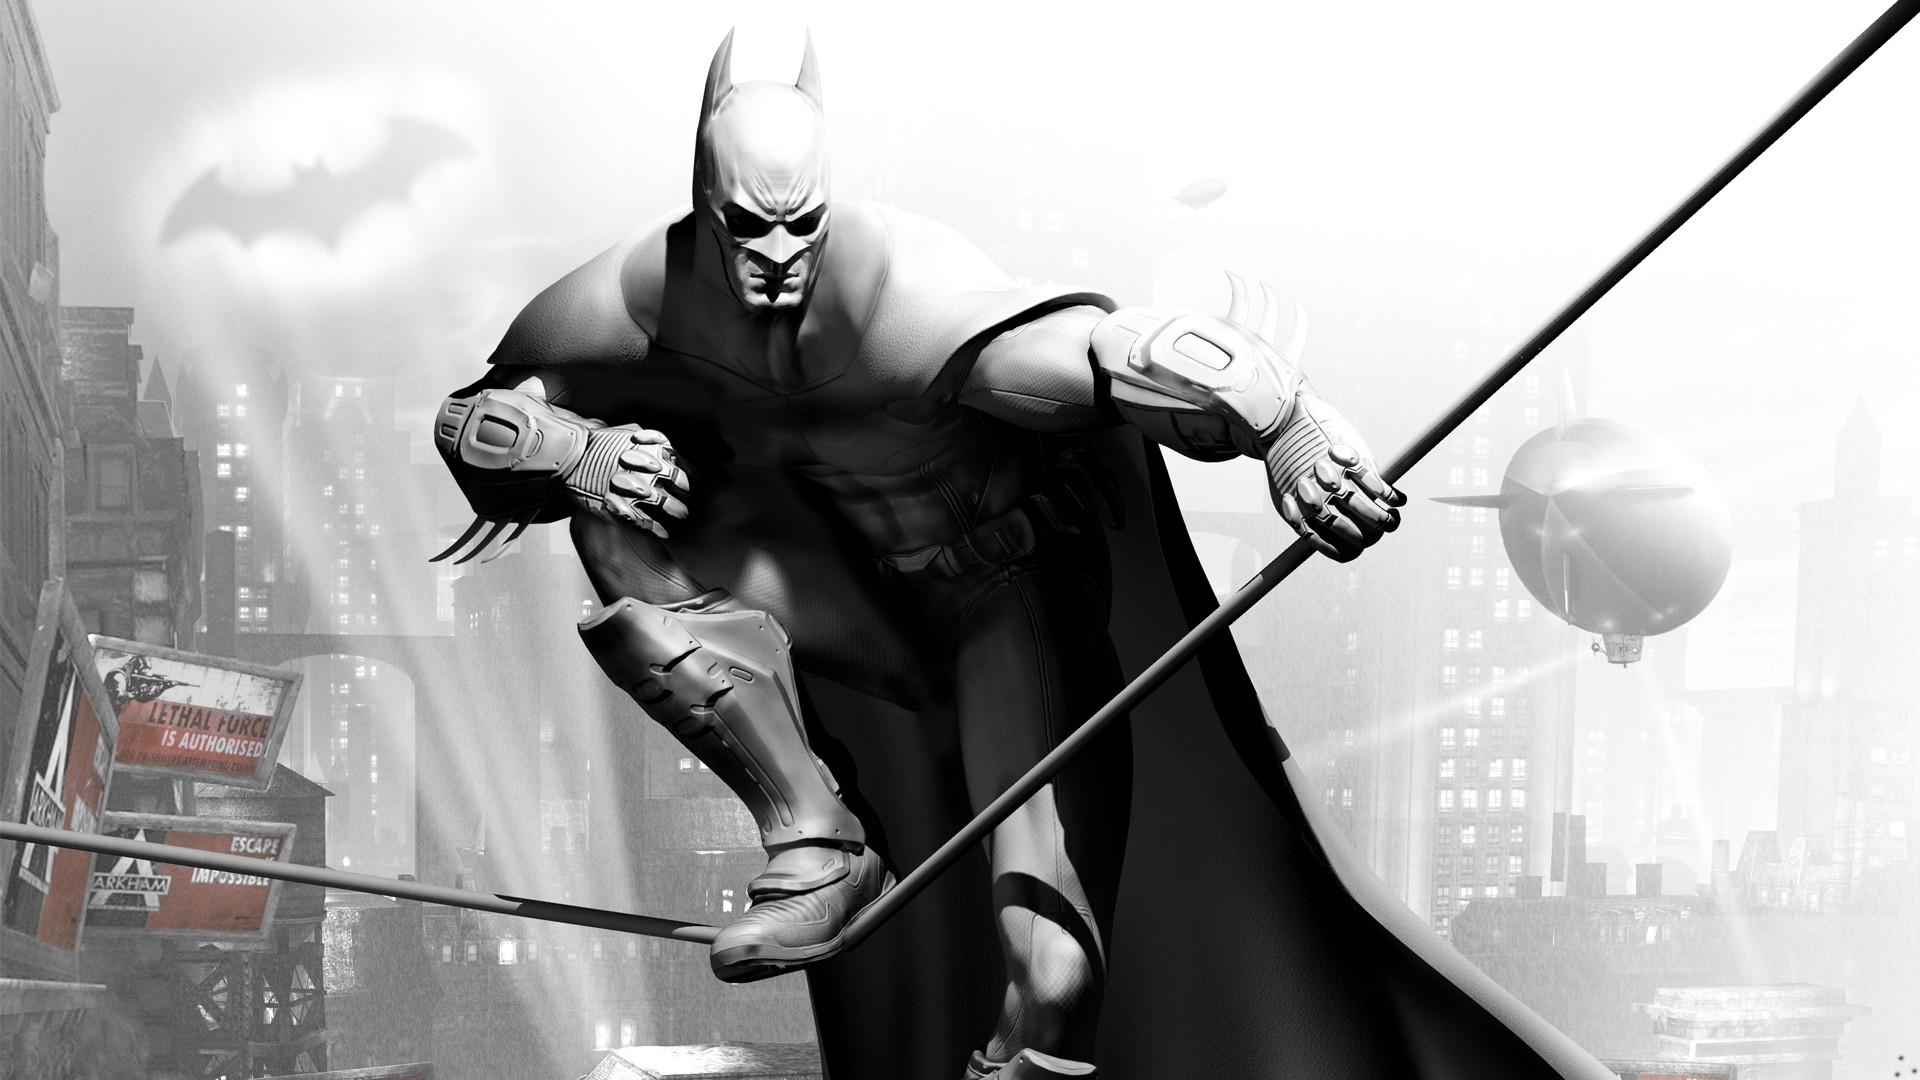 Wallpapers Batman Heroes Comics Batman Hero Games